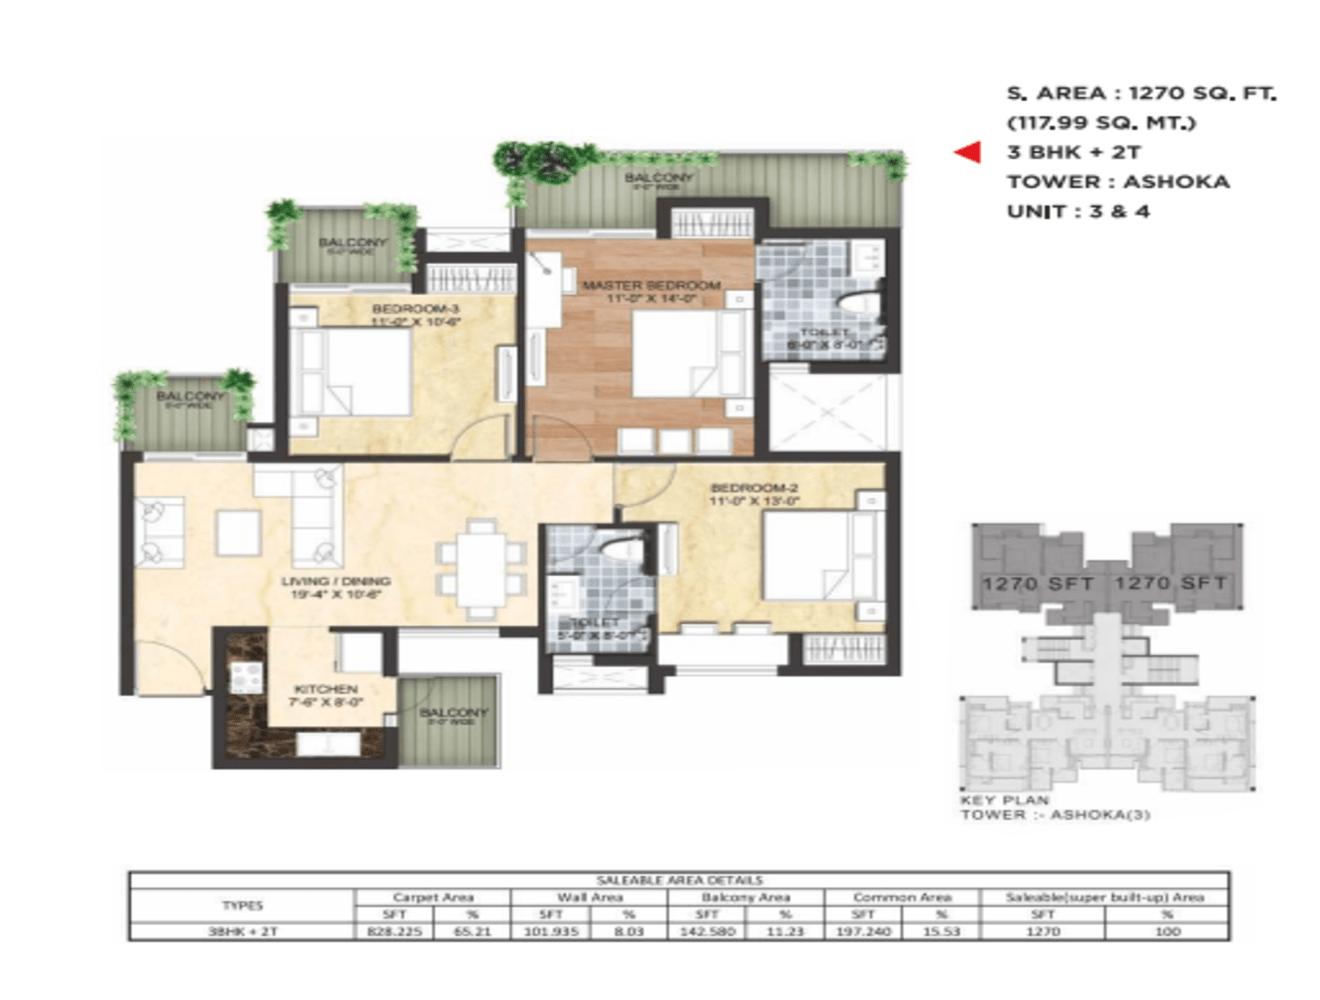 Sikka-Kimaantra-Greens-1270 sq.ft